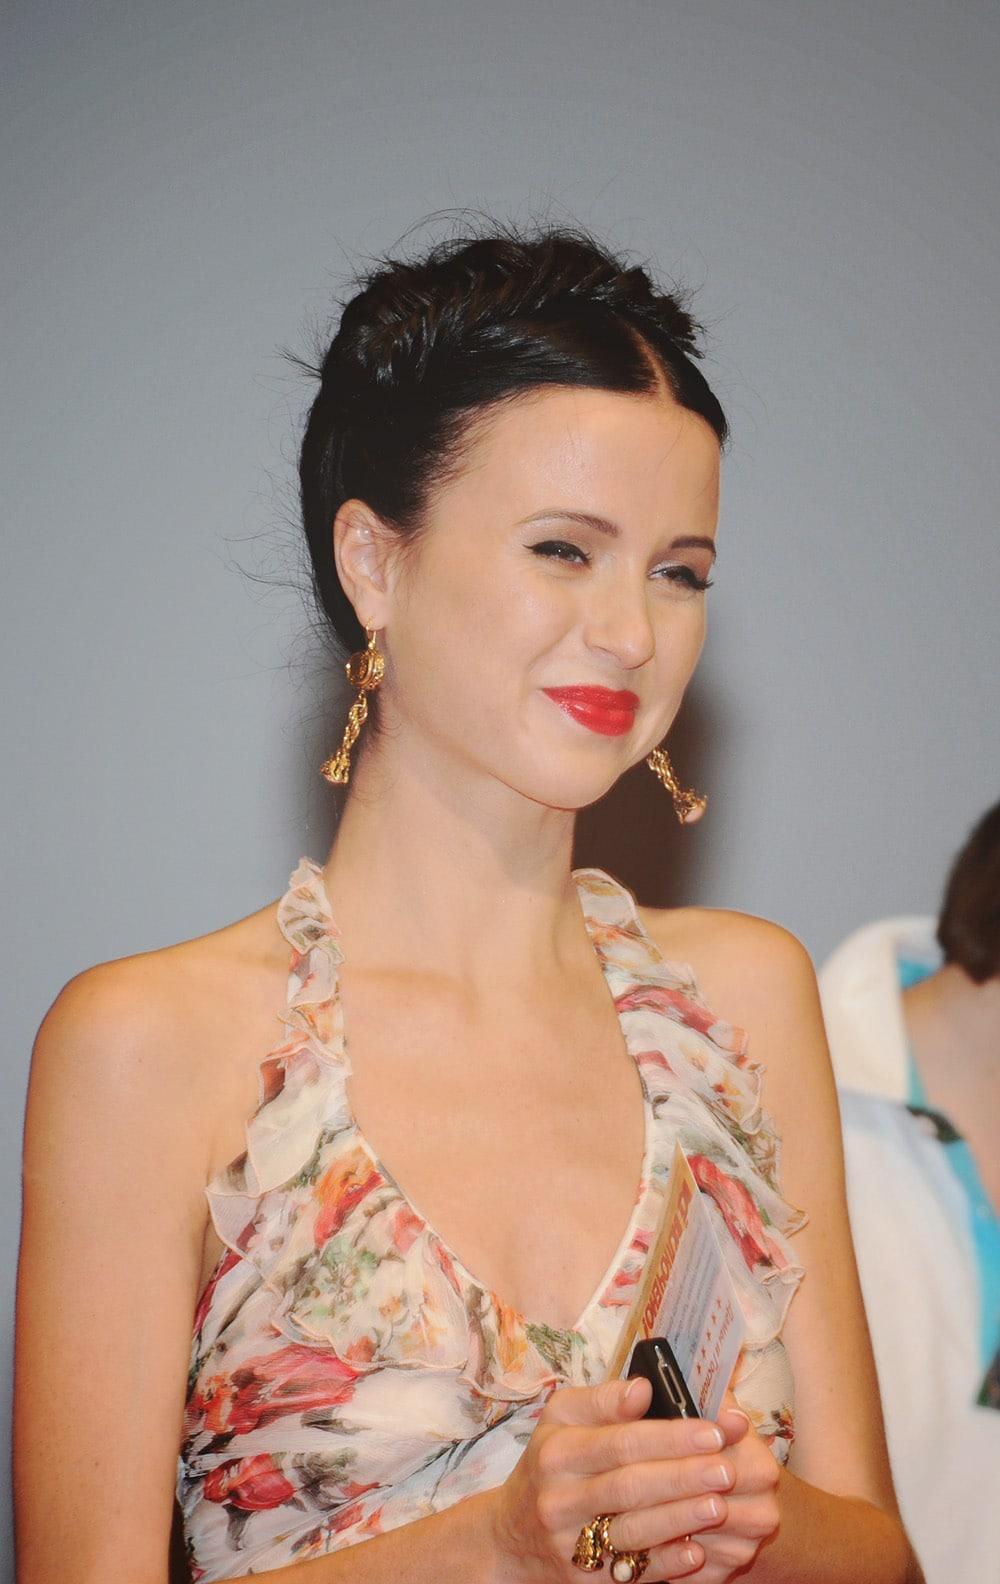 Miroslava Karpovich naked 610